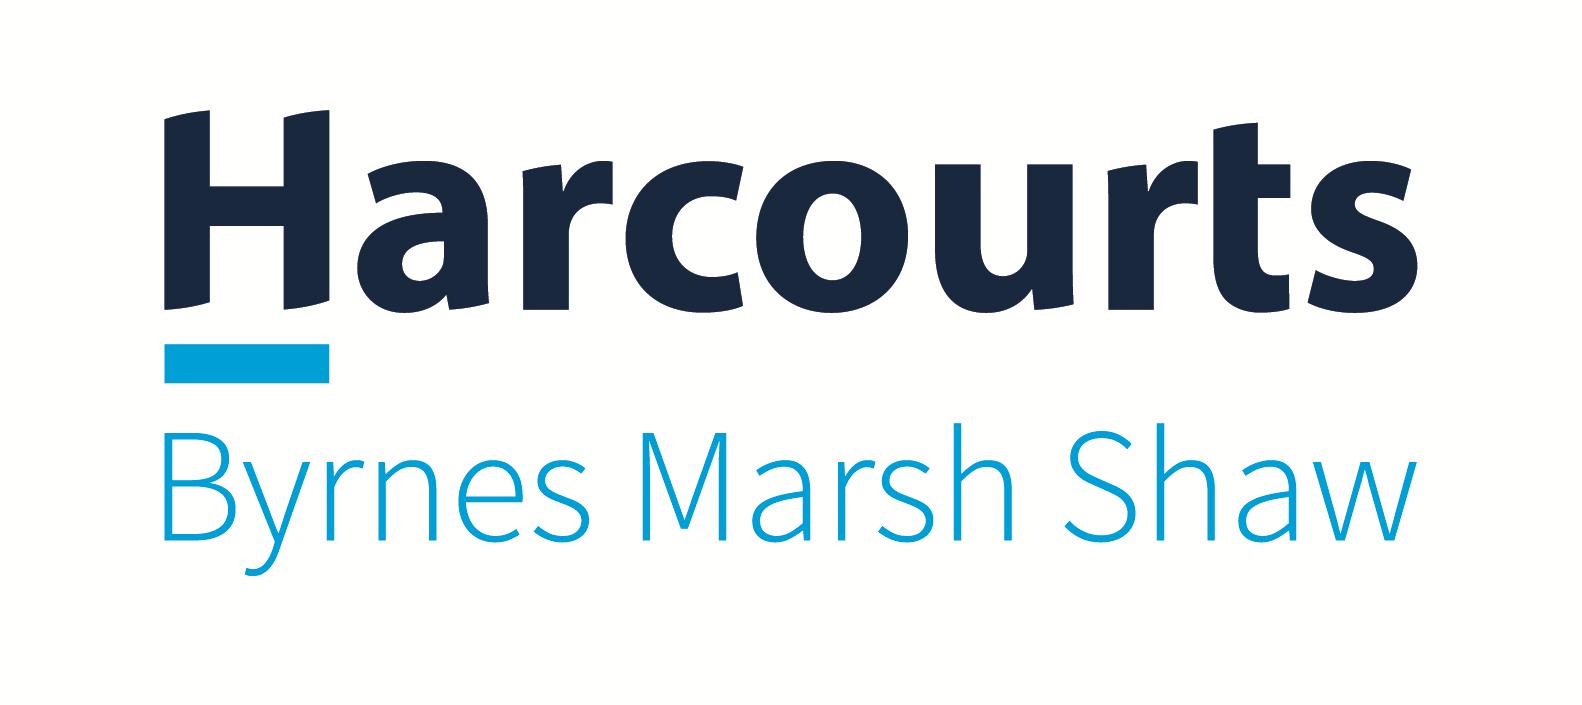 Harcourts Byrnes Marsh Shaw, Randwick, 2031